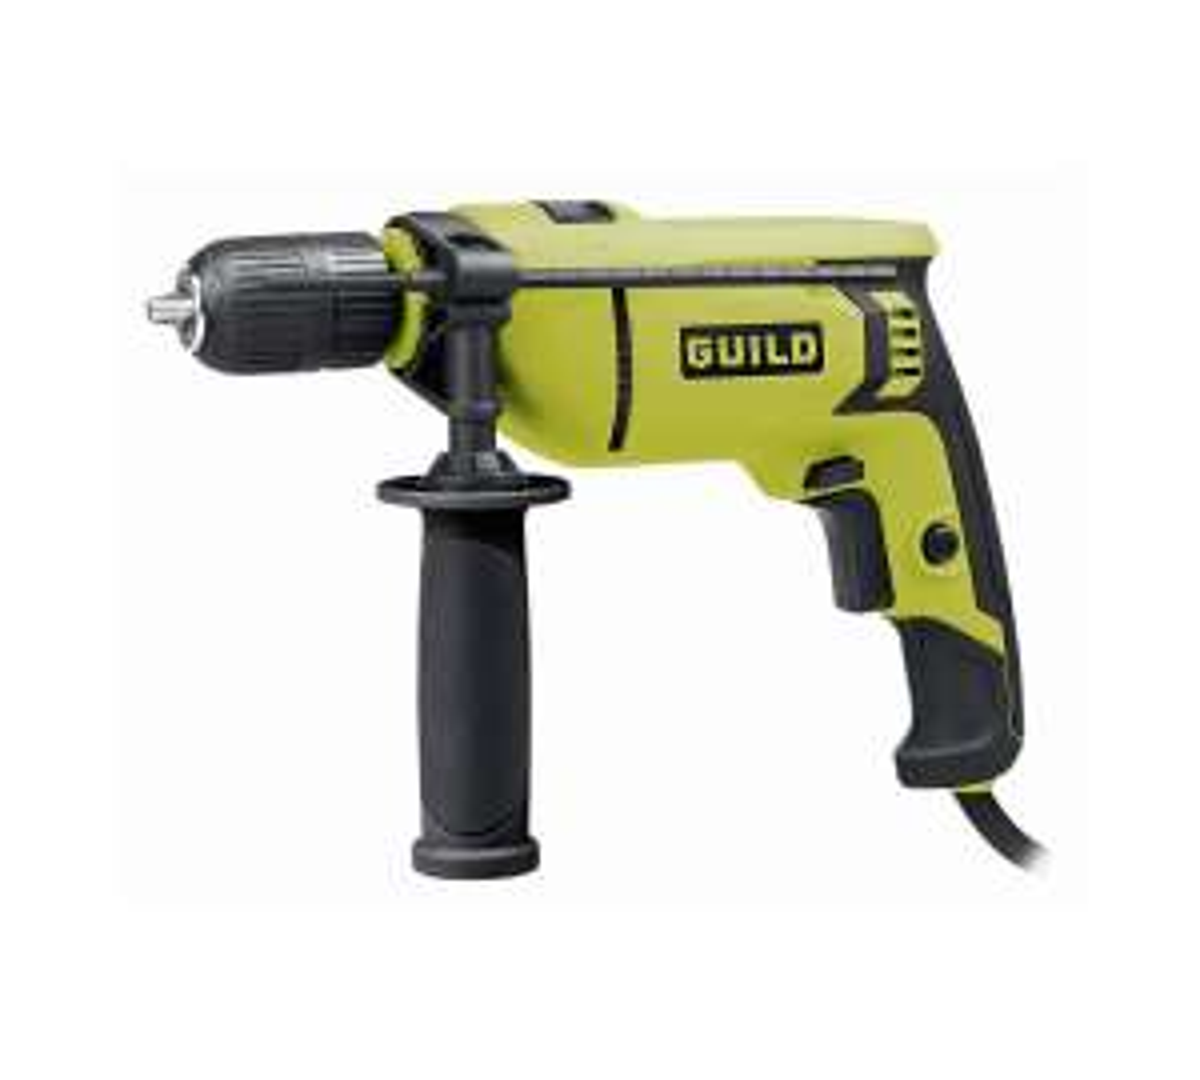 Guild 13mm Keyless Corded Hammer Drill - 750W @ Argos (C+C) - £24.79